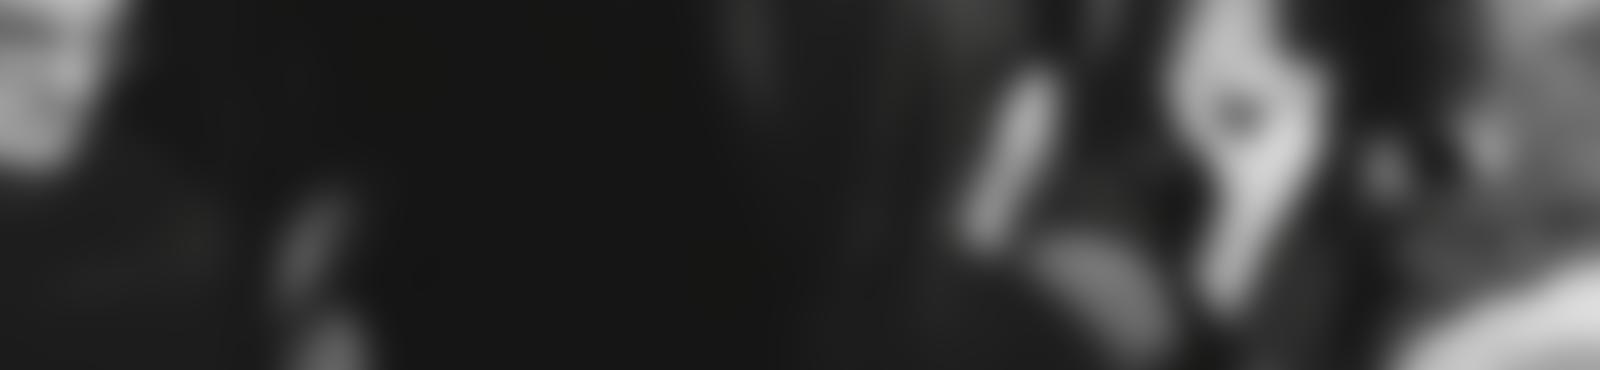 Blurred cd2f3242 44b9 4535 96c8 f1a39d18d431